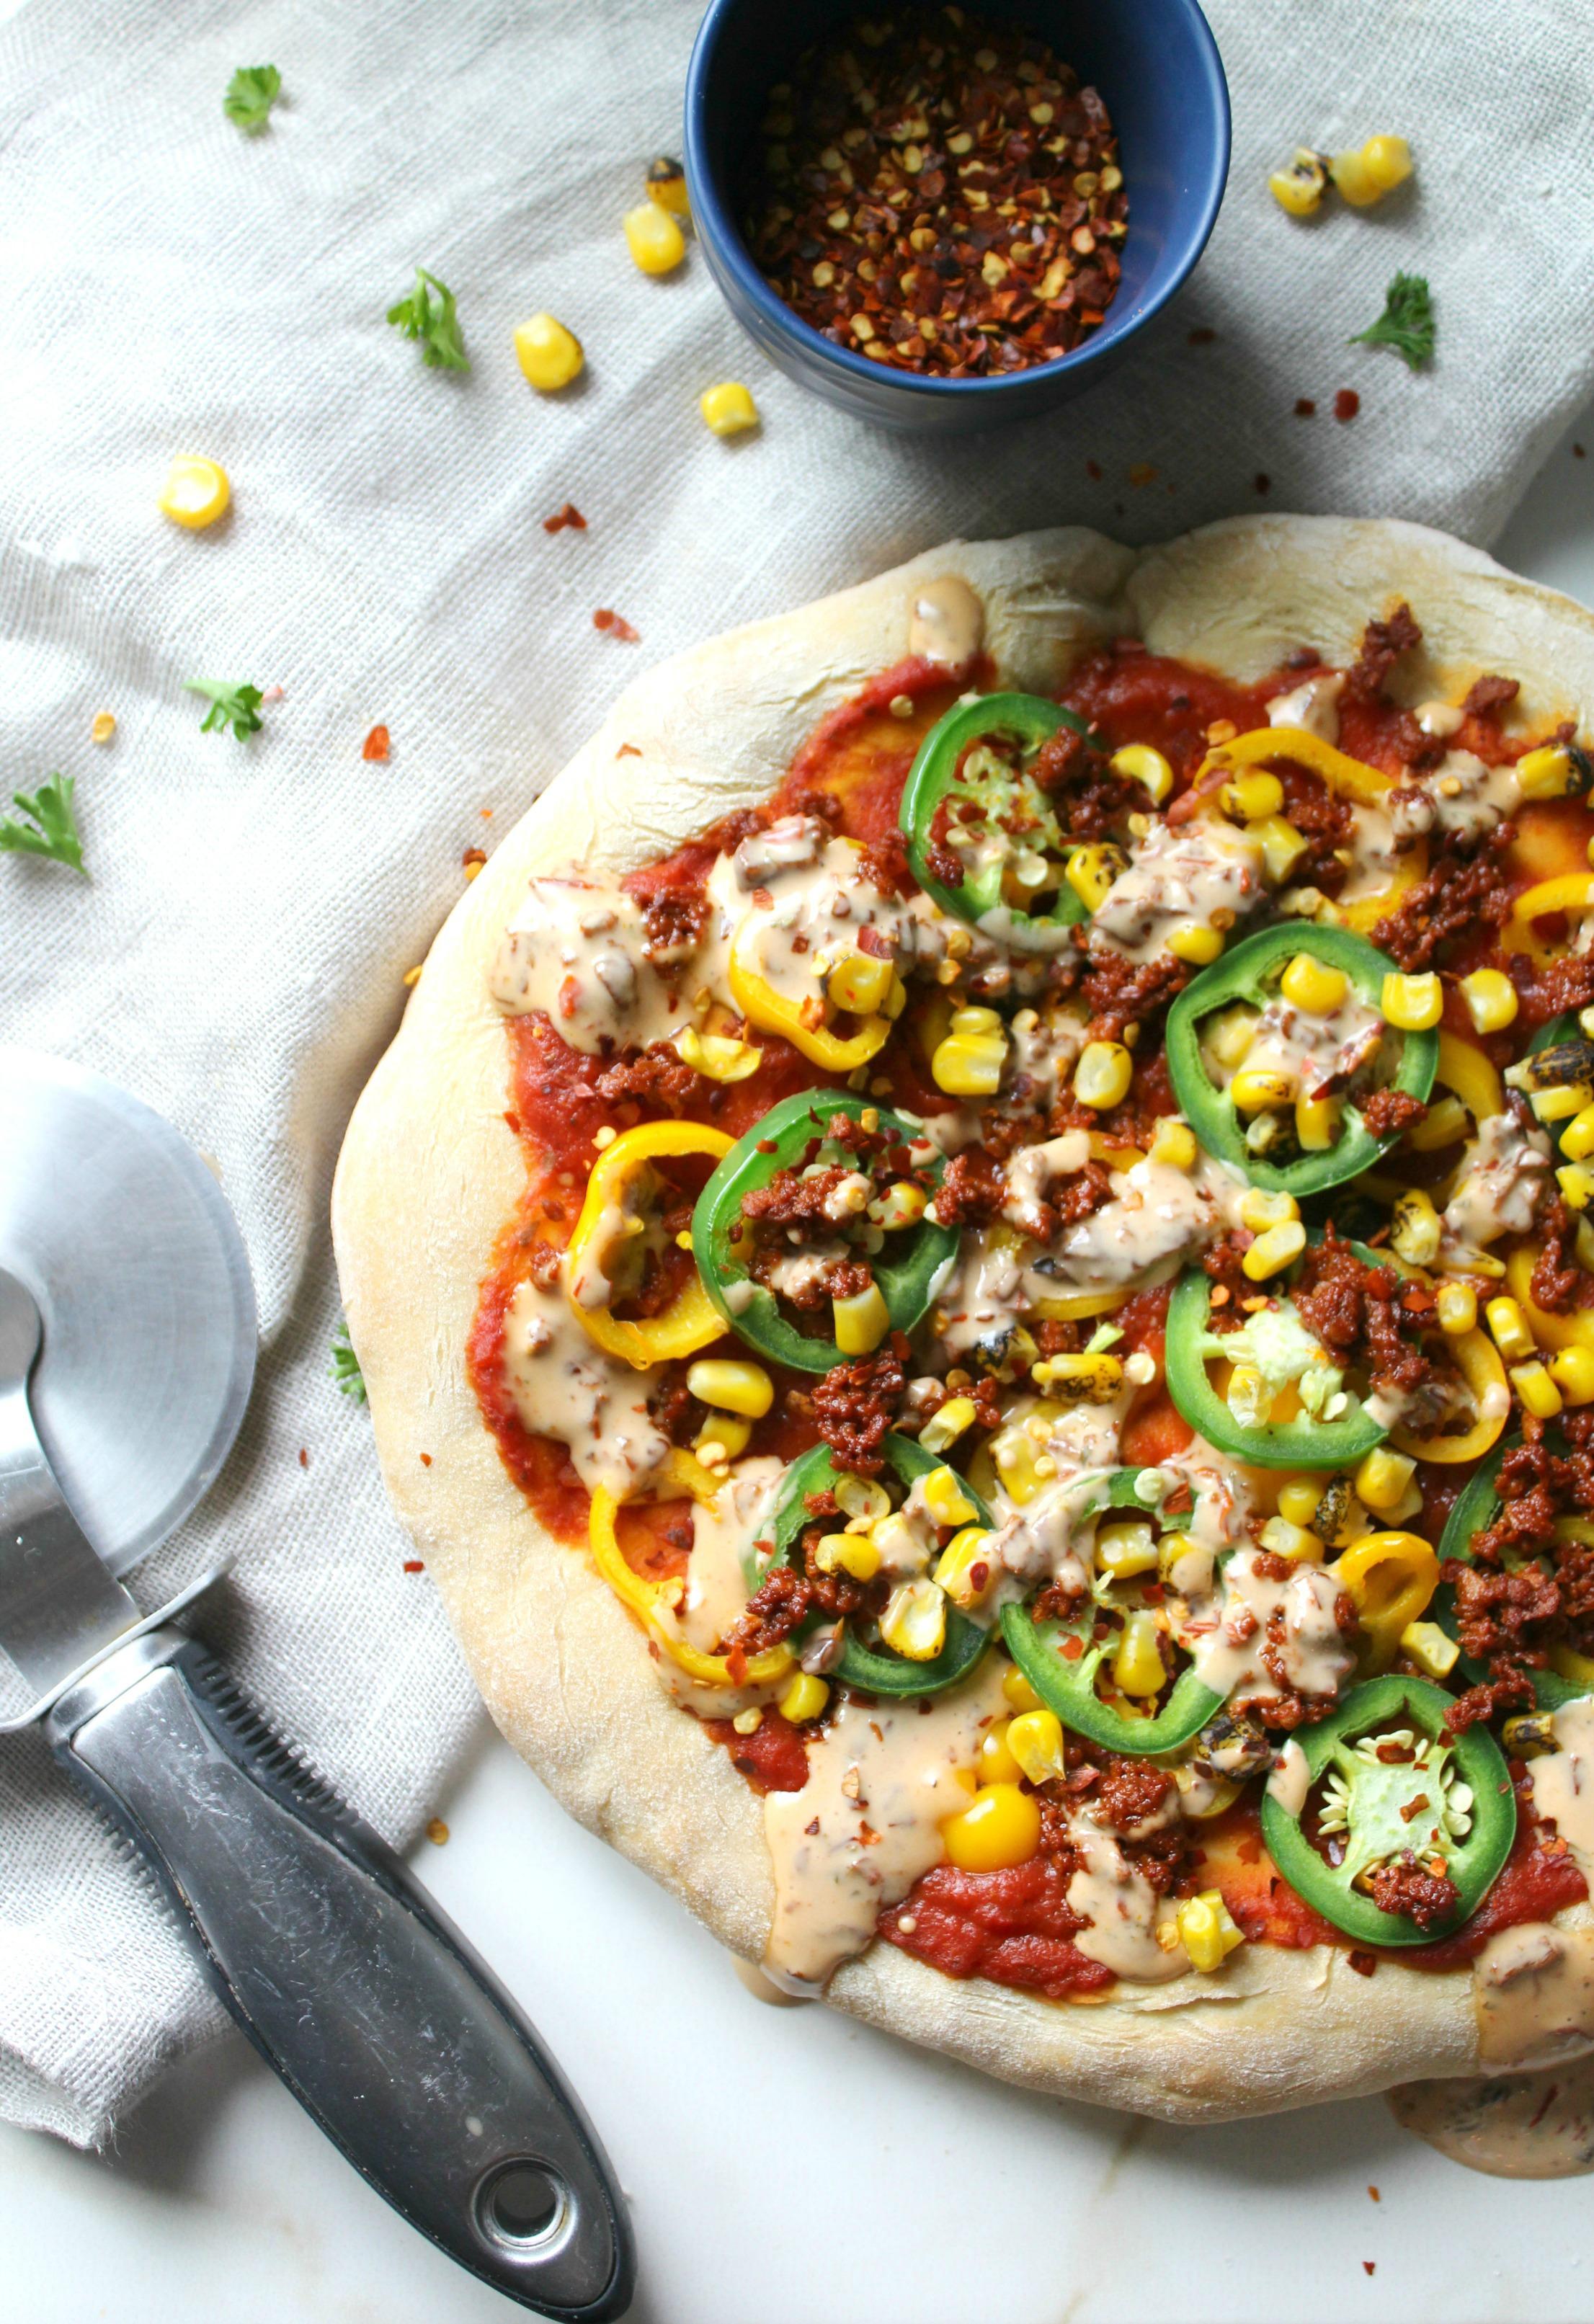 Soyrizo Pizza with Vegan Chipotle Ranch | No-Cheese | ThisSavoryVegan.com